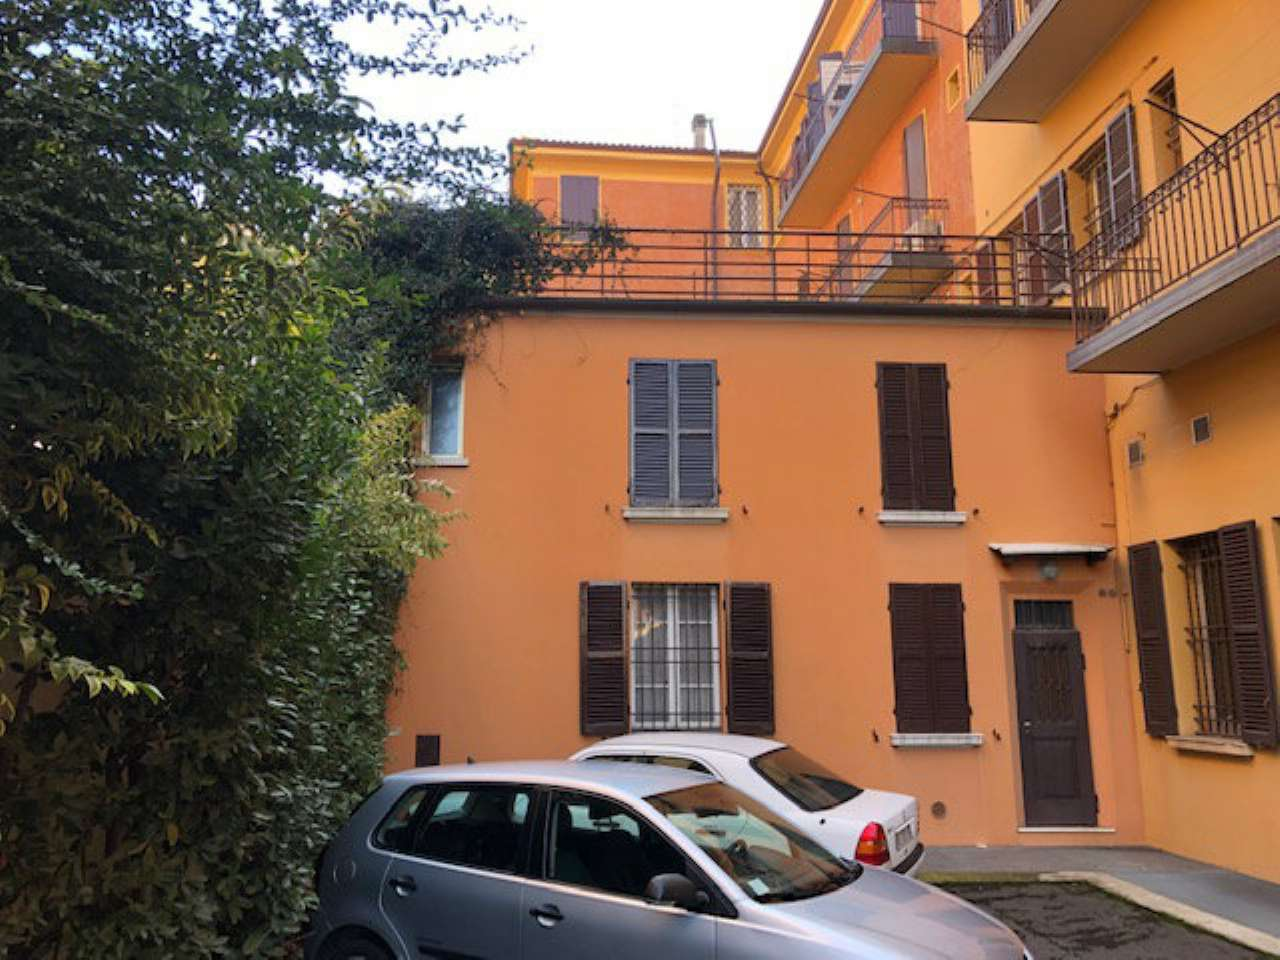 Foto 1 di Casa indipendente via De' Carracci  7, Bologna (zona Bolognina)